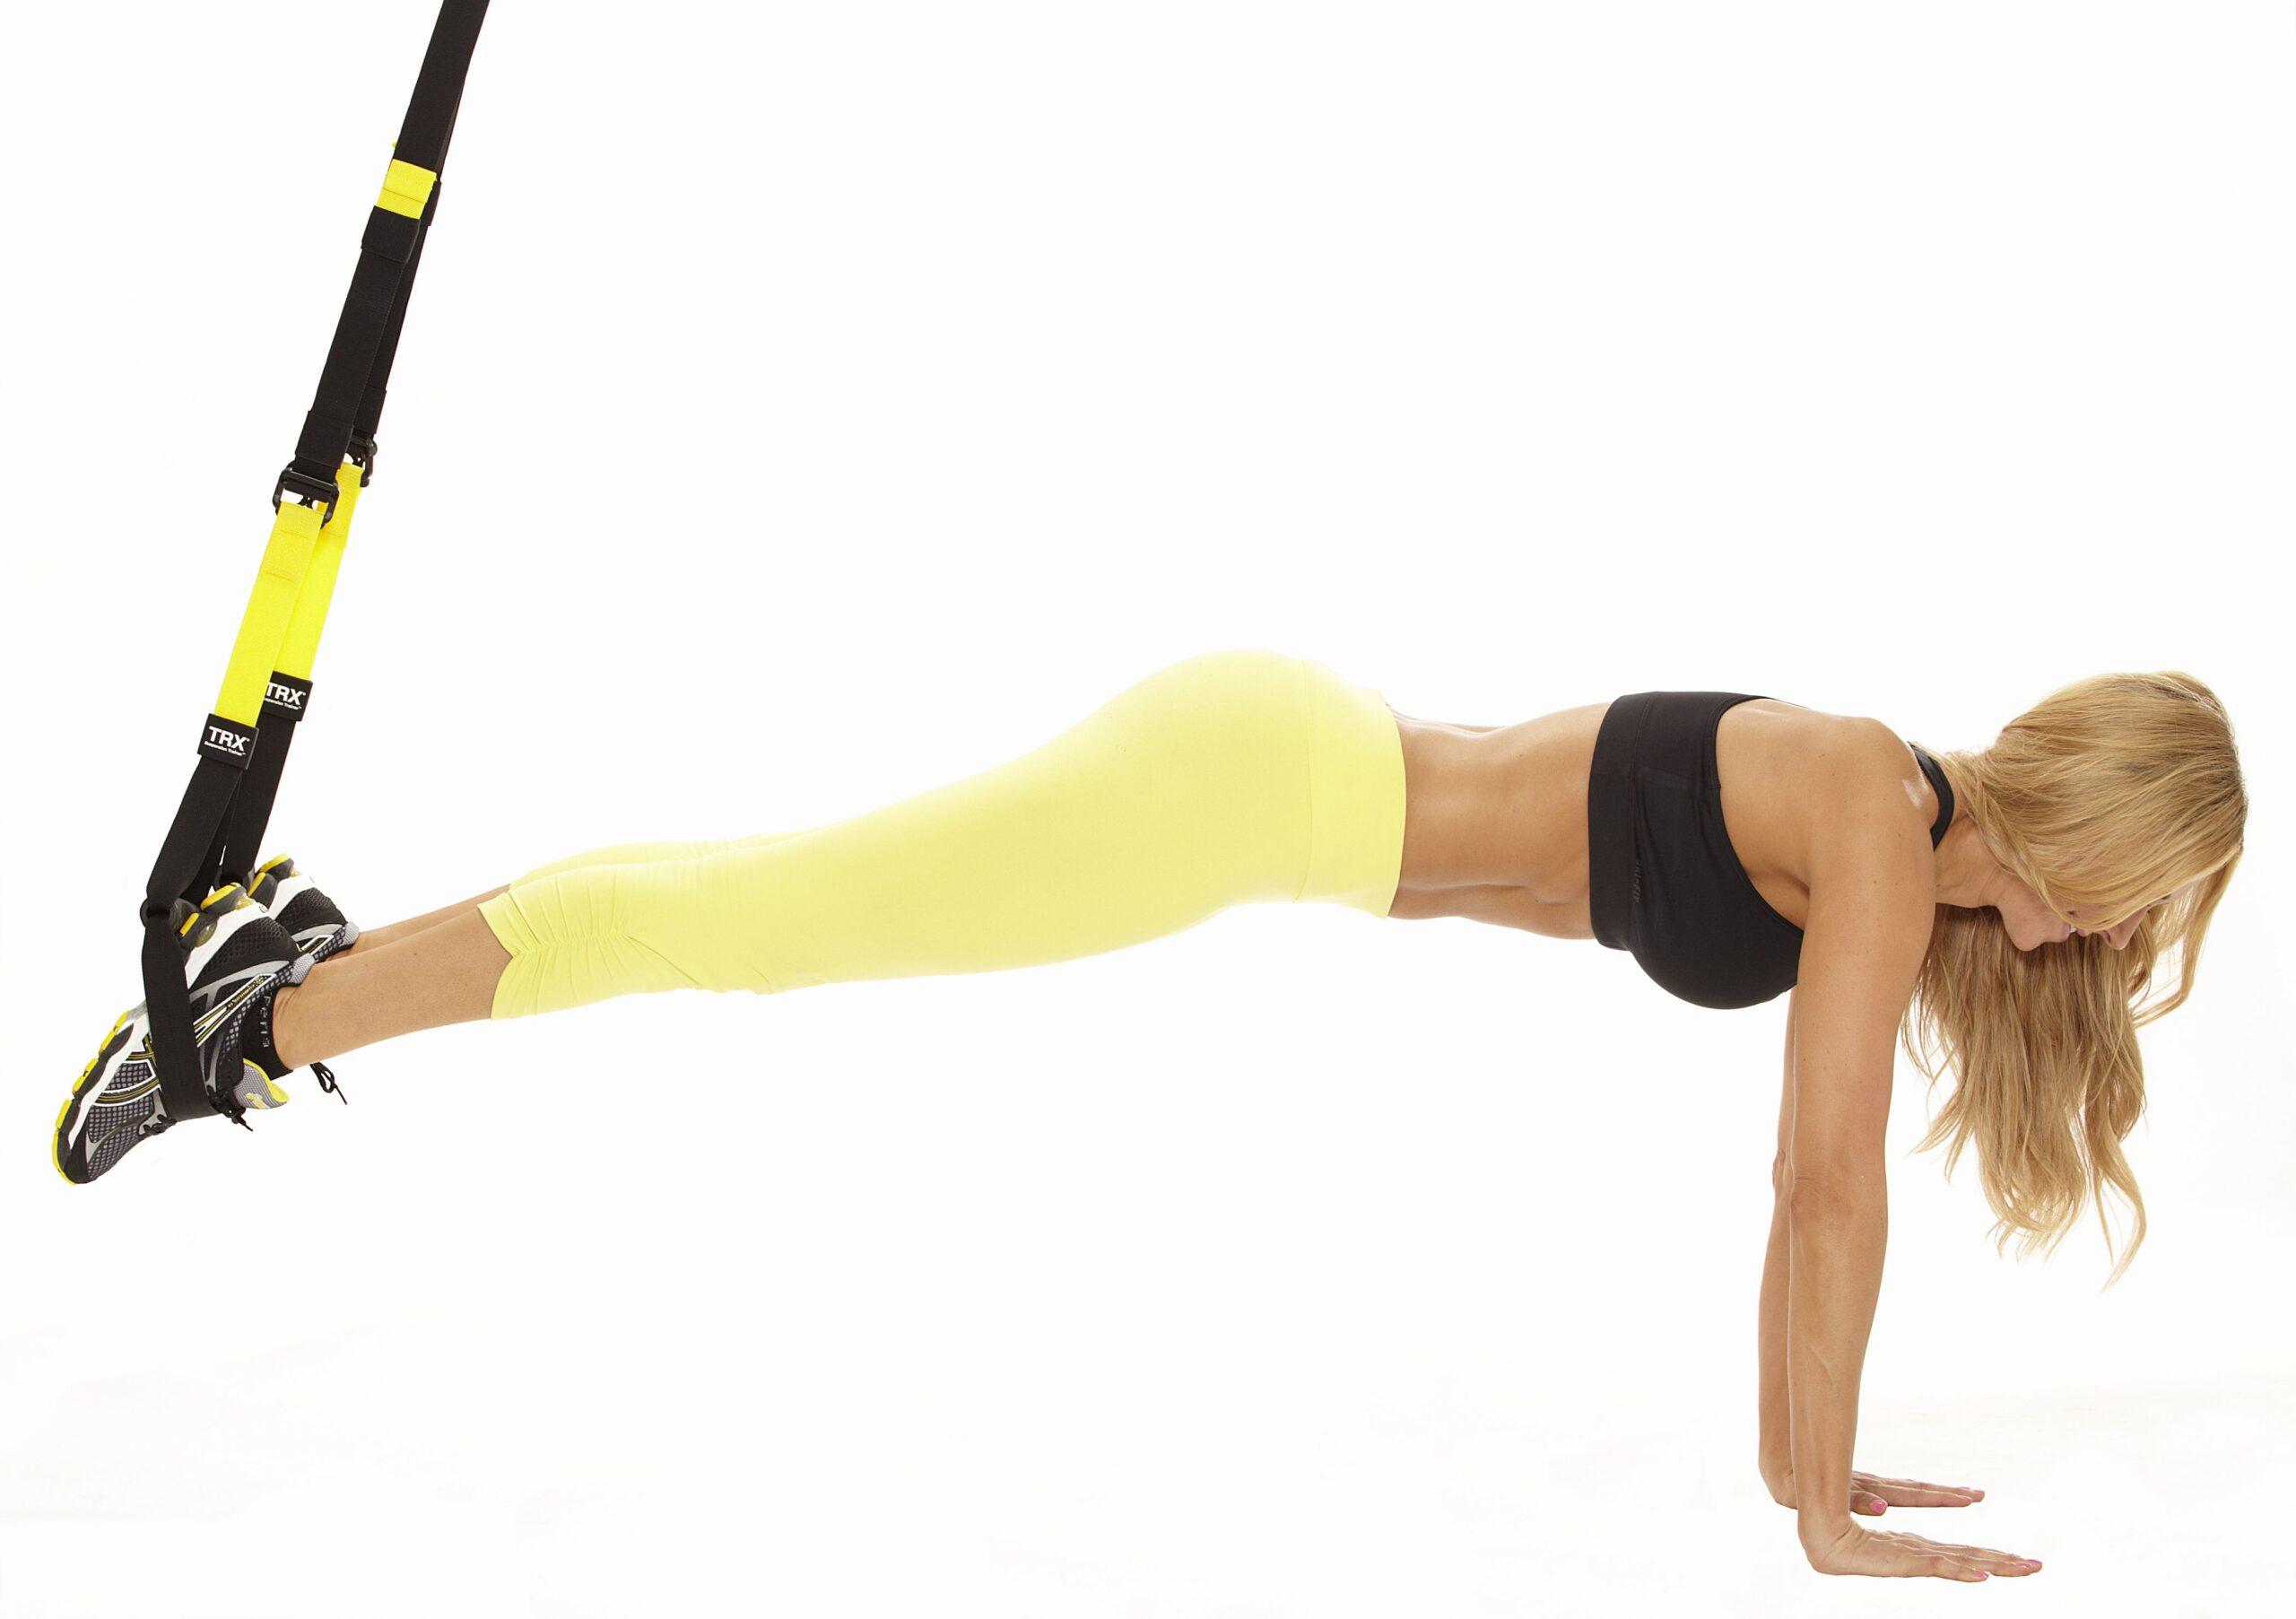 TRX e Dansyng: le nuove frontiere del fitness